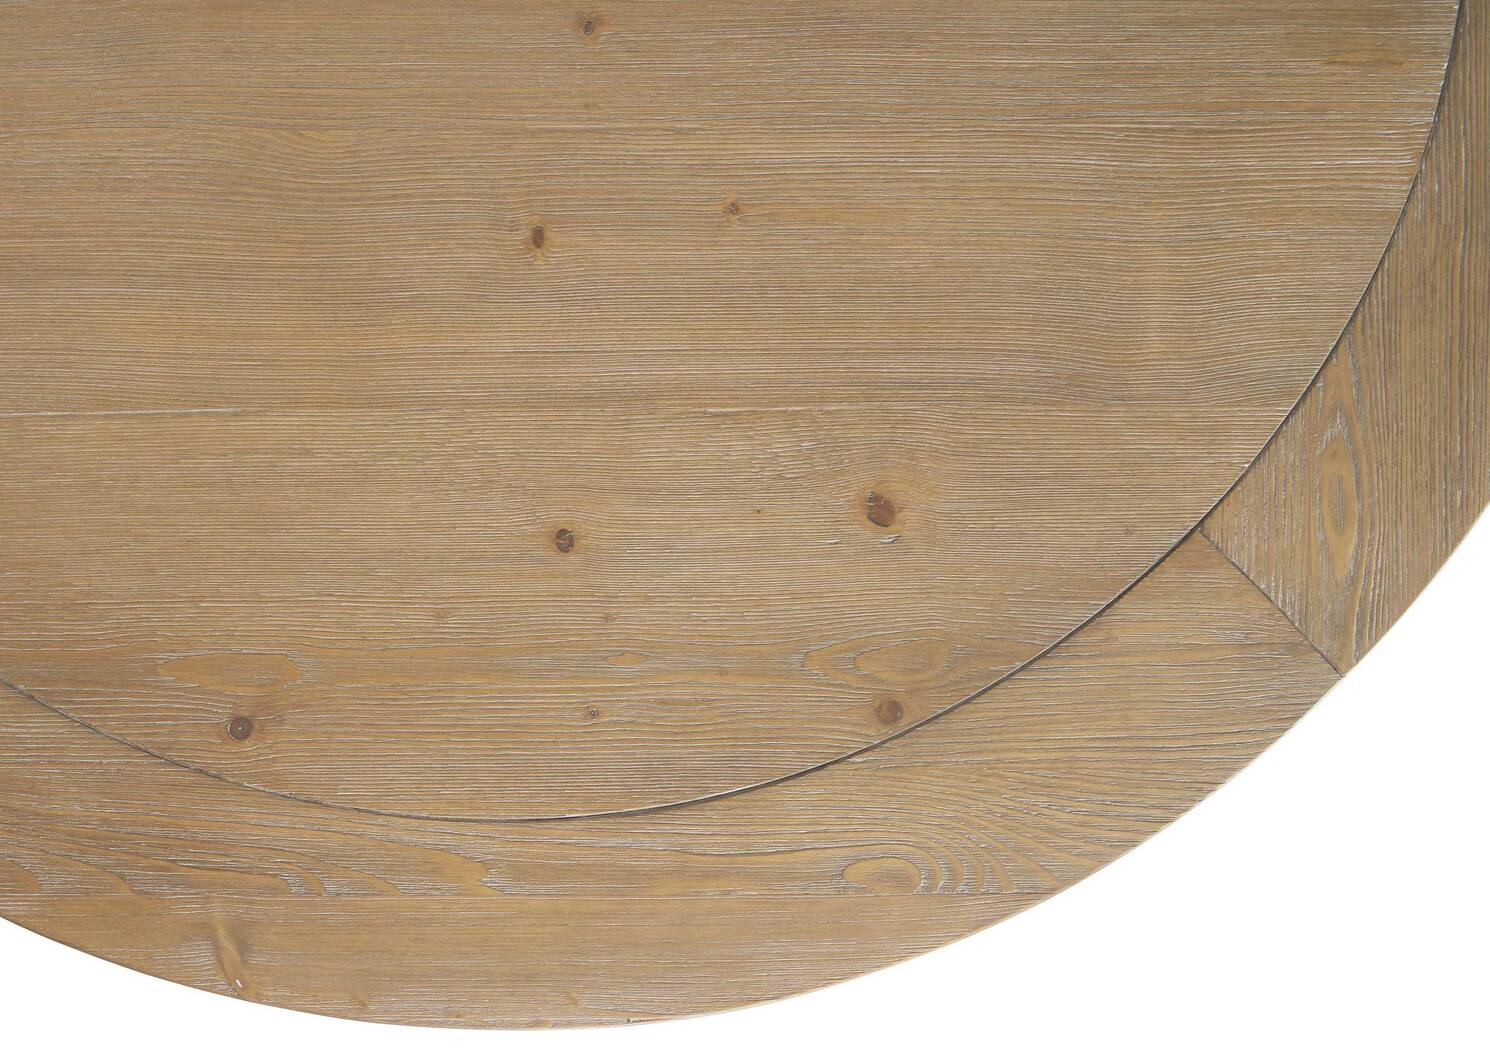 Table ronde Baybridge -Claire faon